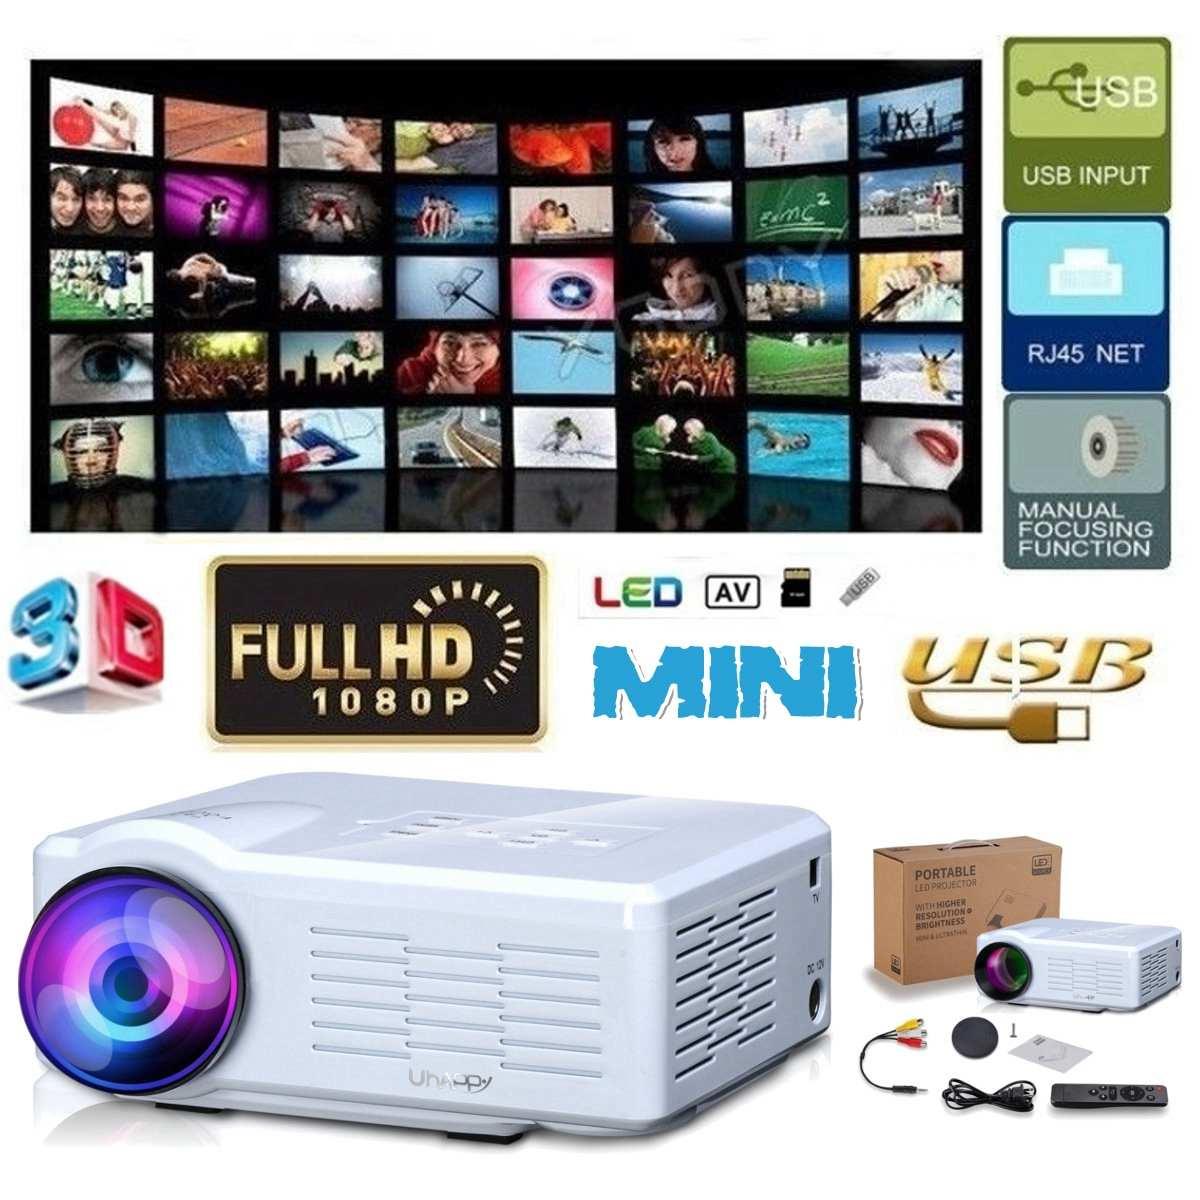 Hd mini projetor nativo 800x480 led wi fi proyector 7000 lumens vídeo cinema em casa 3d hdmi filme jogo proyector